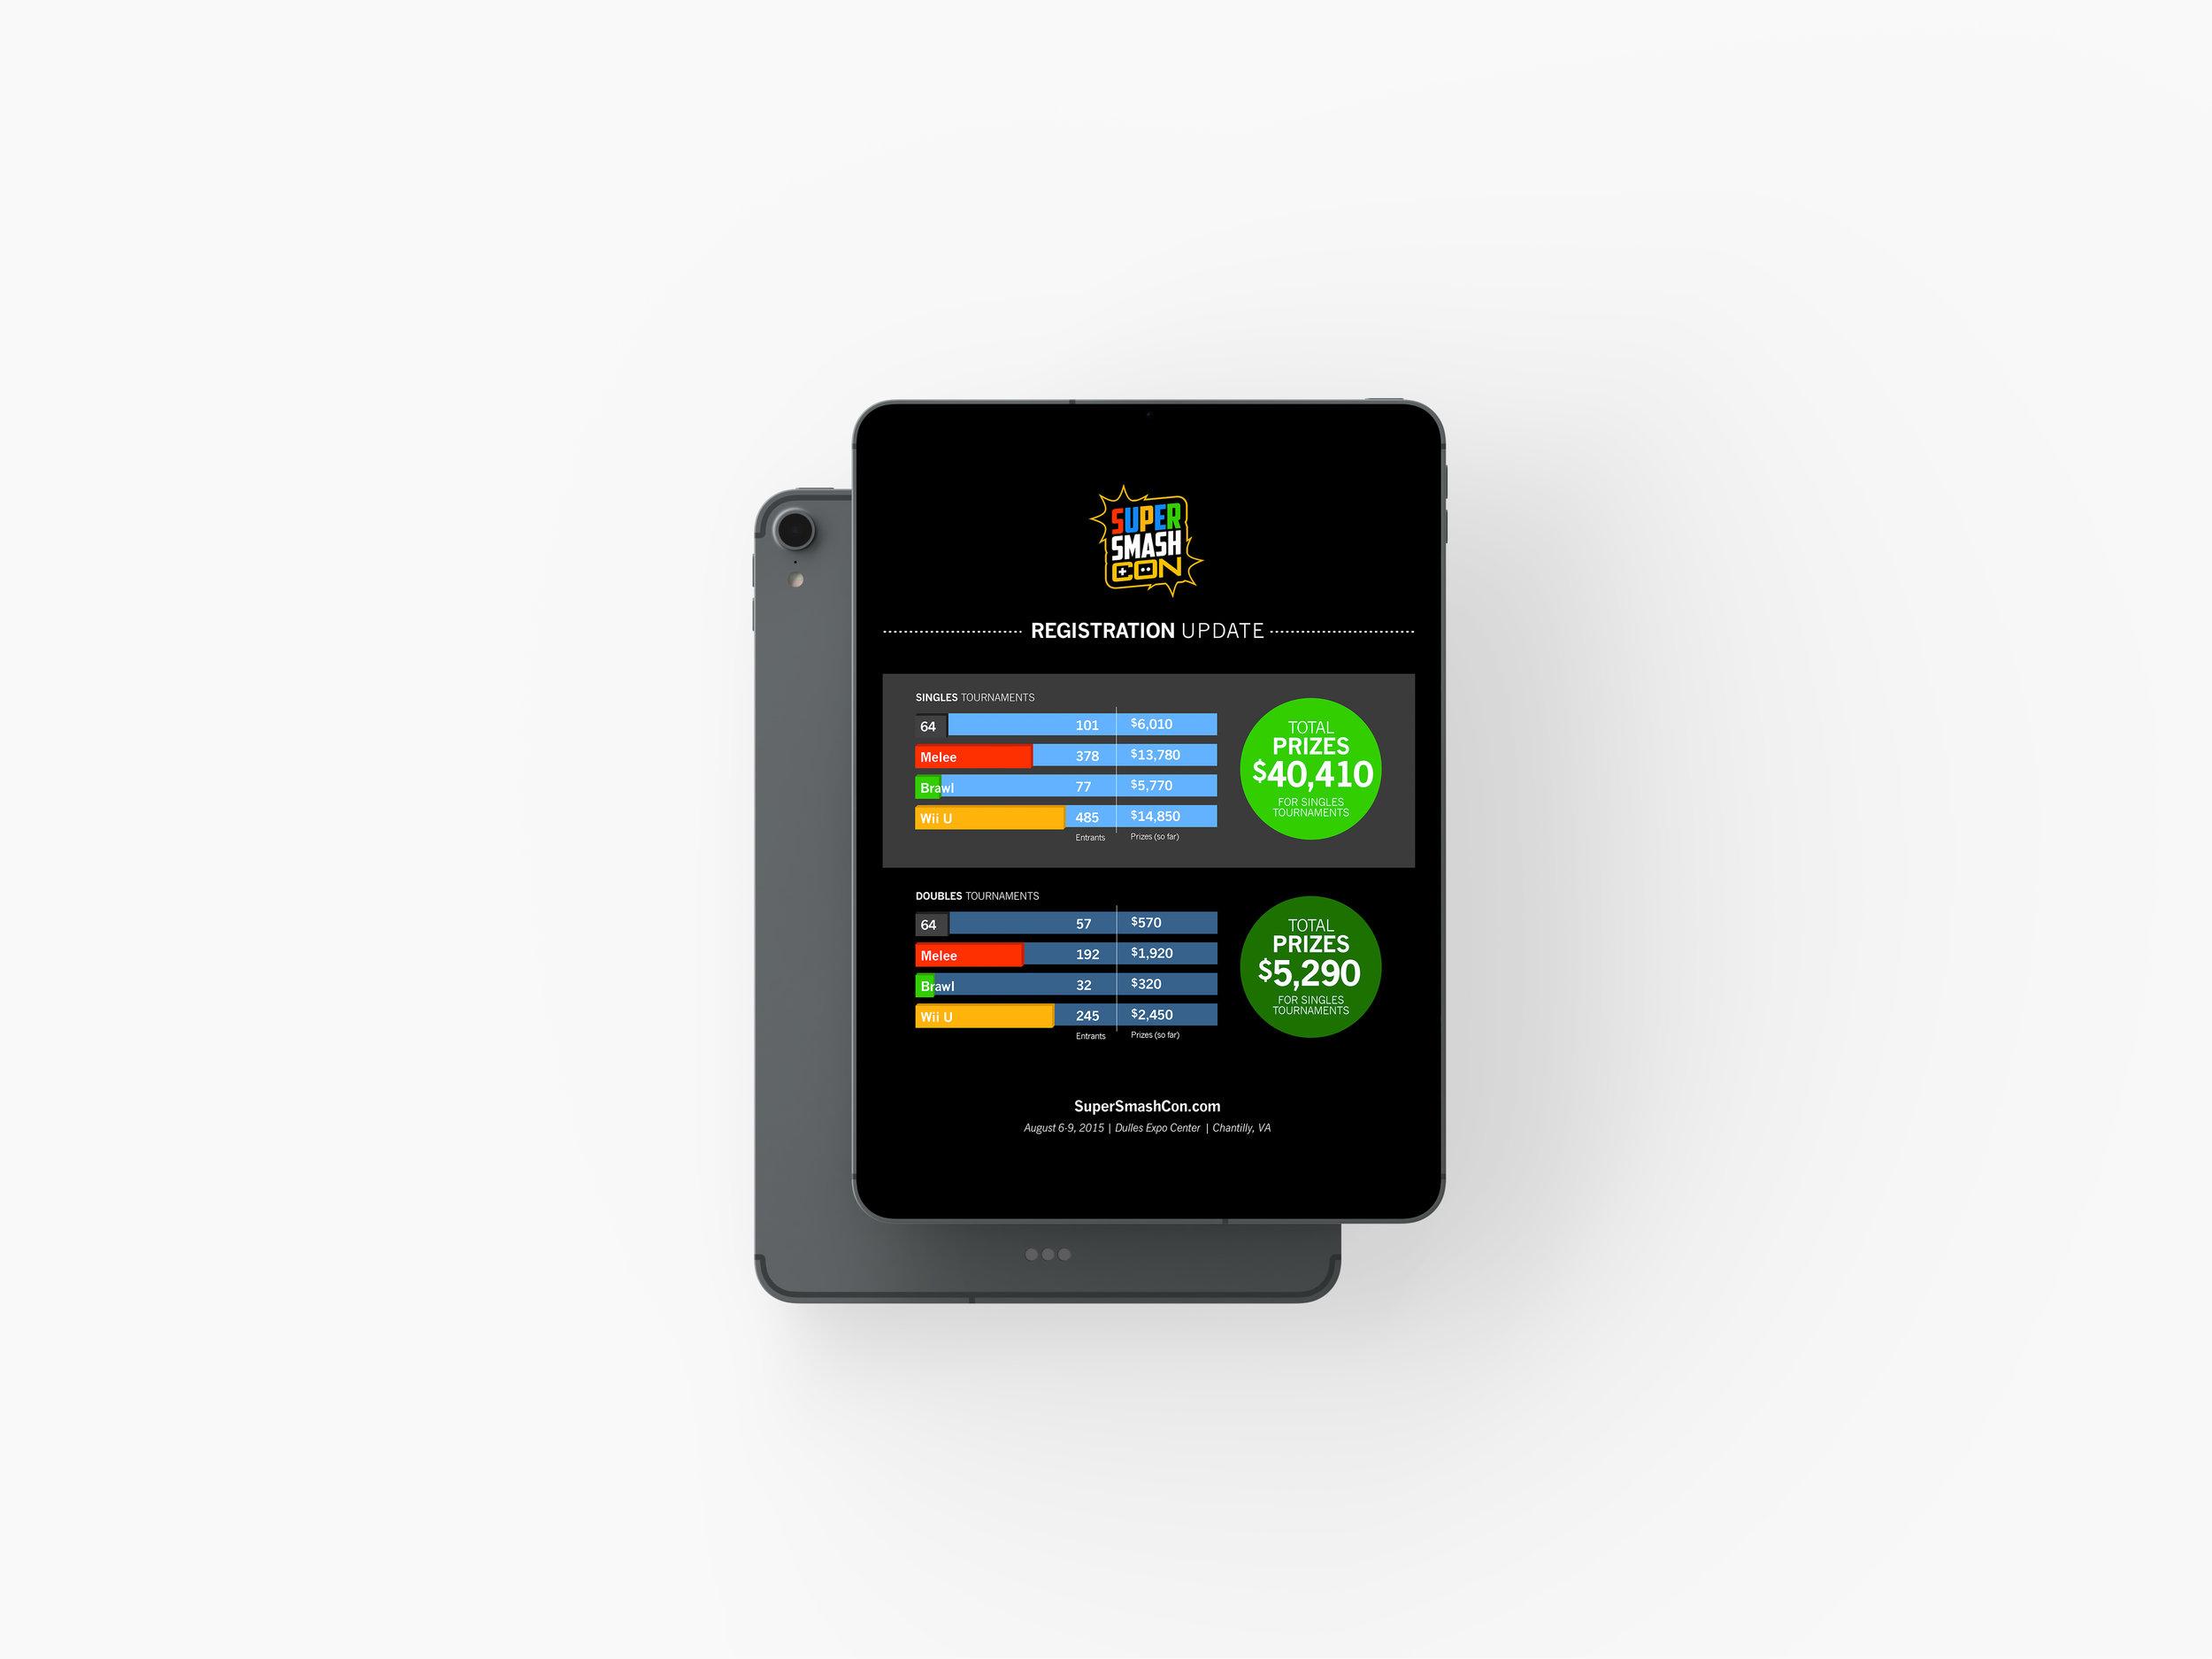 SSC_iPad_3.jpg